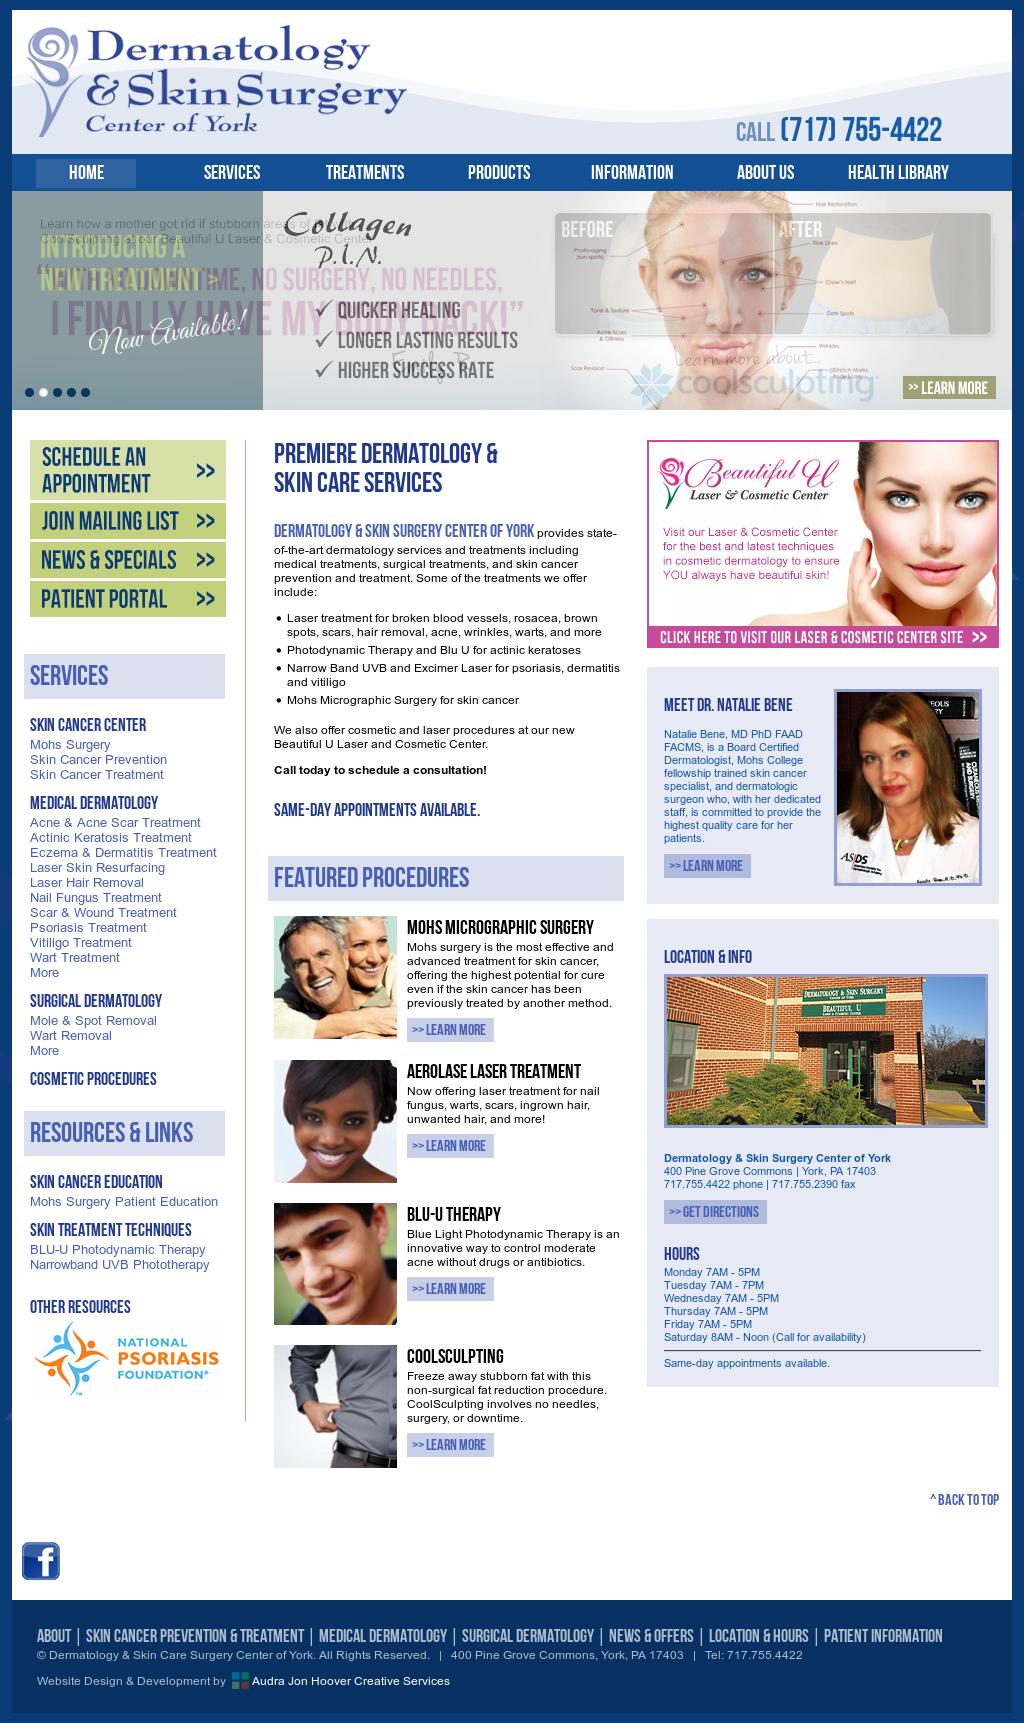 Dermatology & Skin Surgery Center of York Competitors